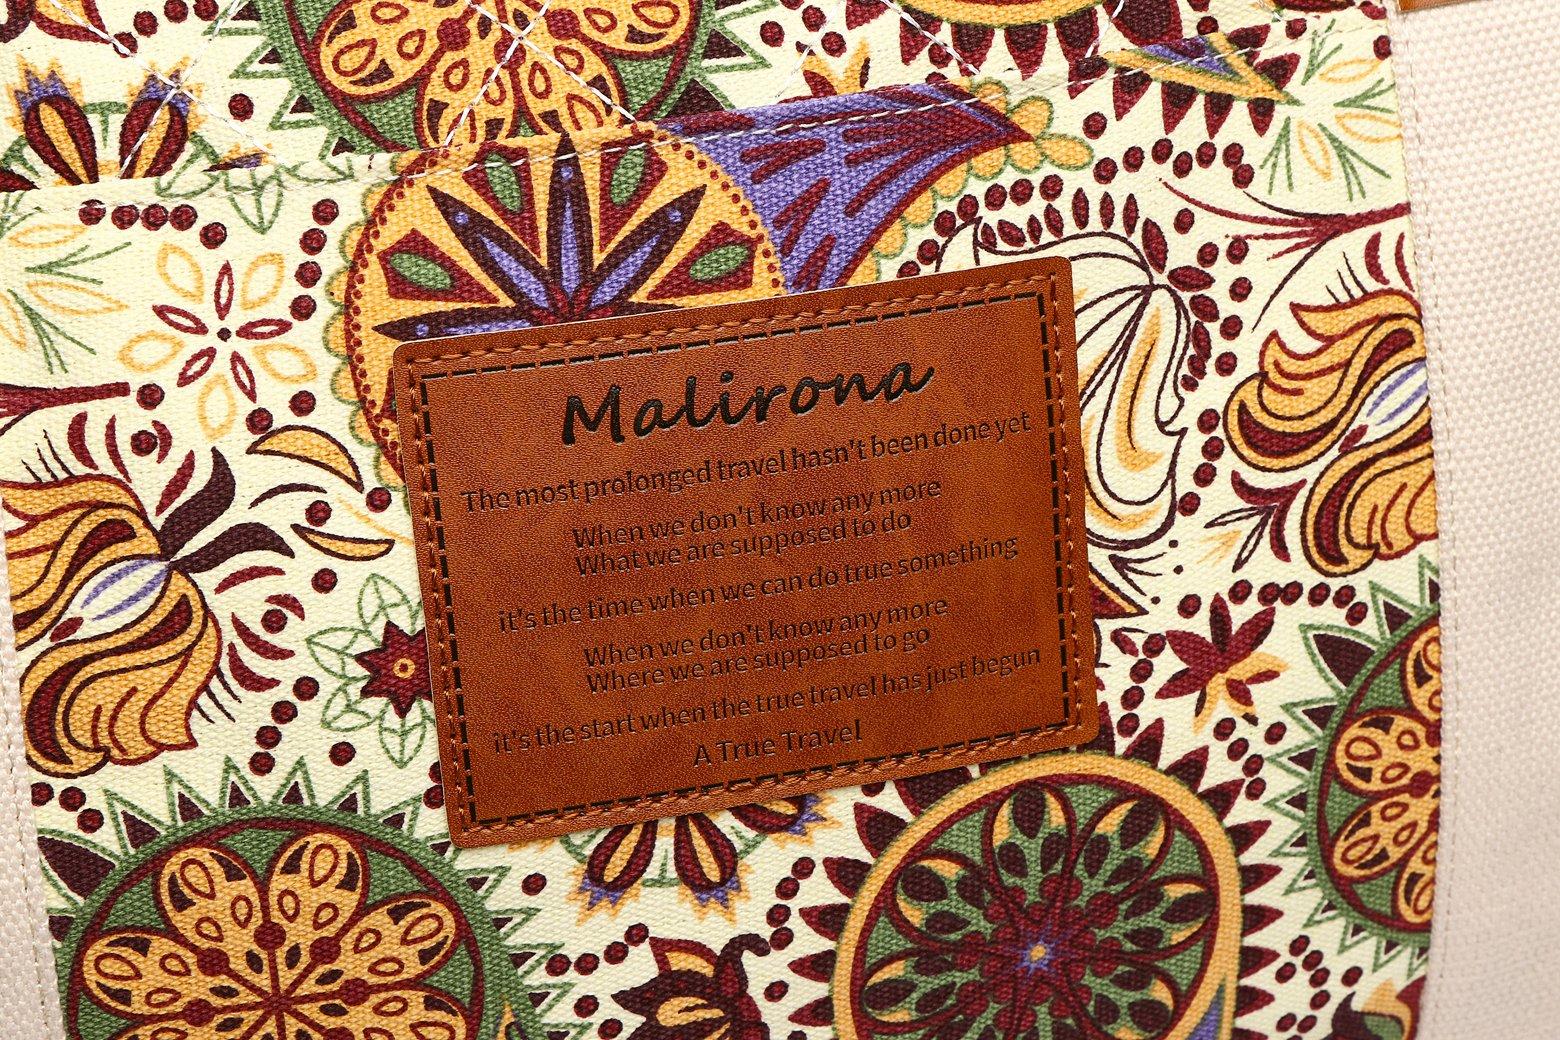 Malirona Canvas Weekender Bag Travel Duffel Bag for Weekend Overnight Trip (Yellow Flower) by Malirona (Image #7)